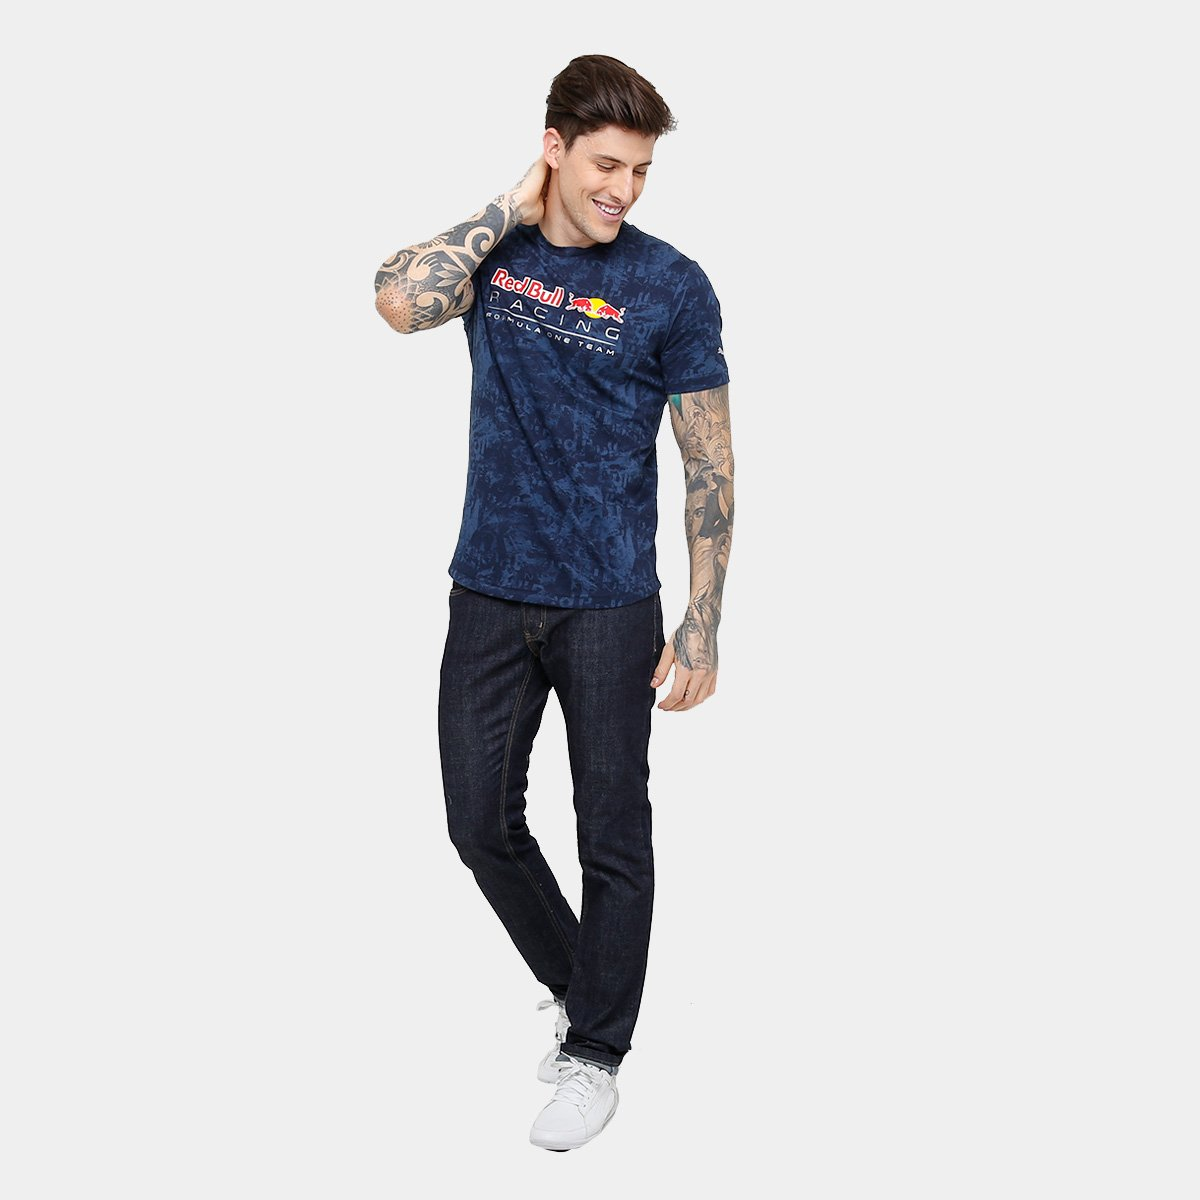 Camiseta Puma Red Bull Racing Allover Masculina - Compre Agora  560e688db40